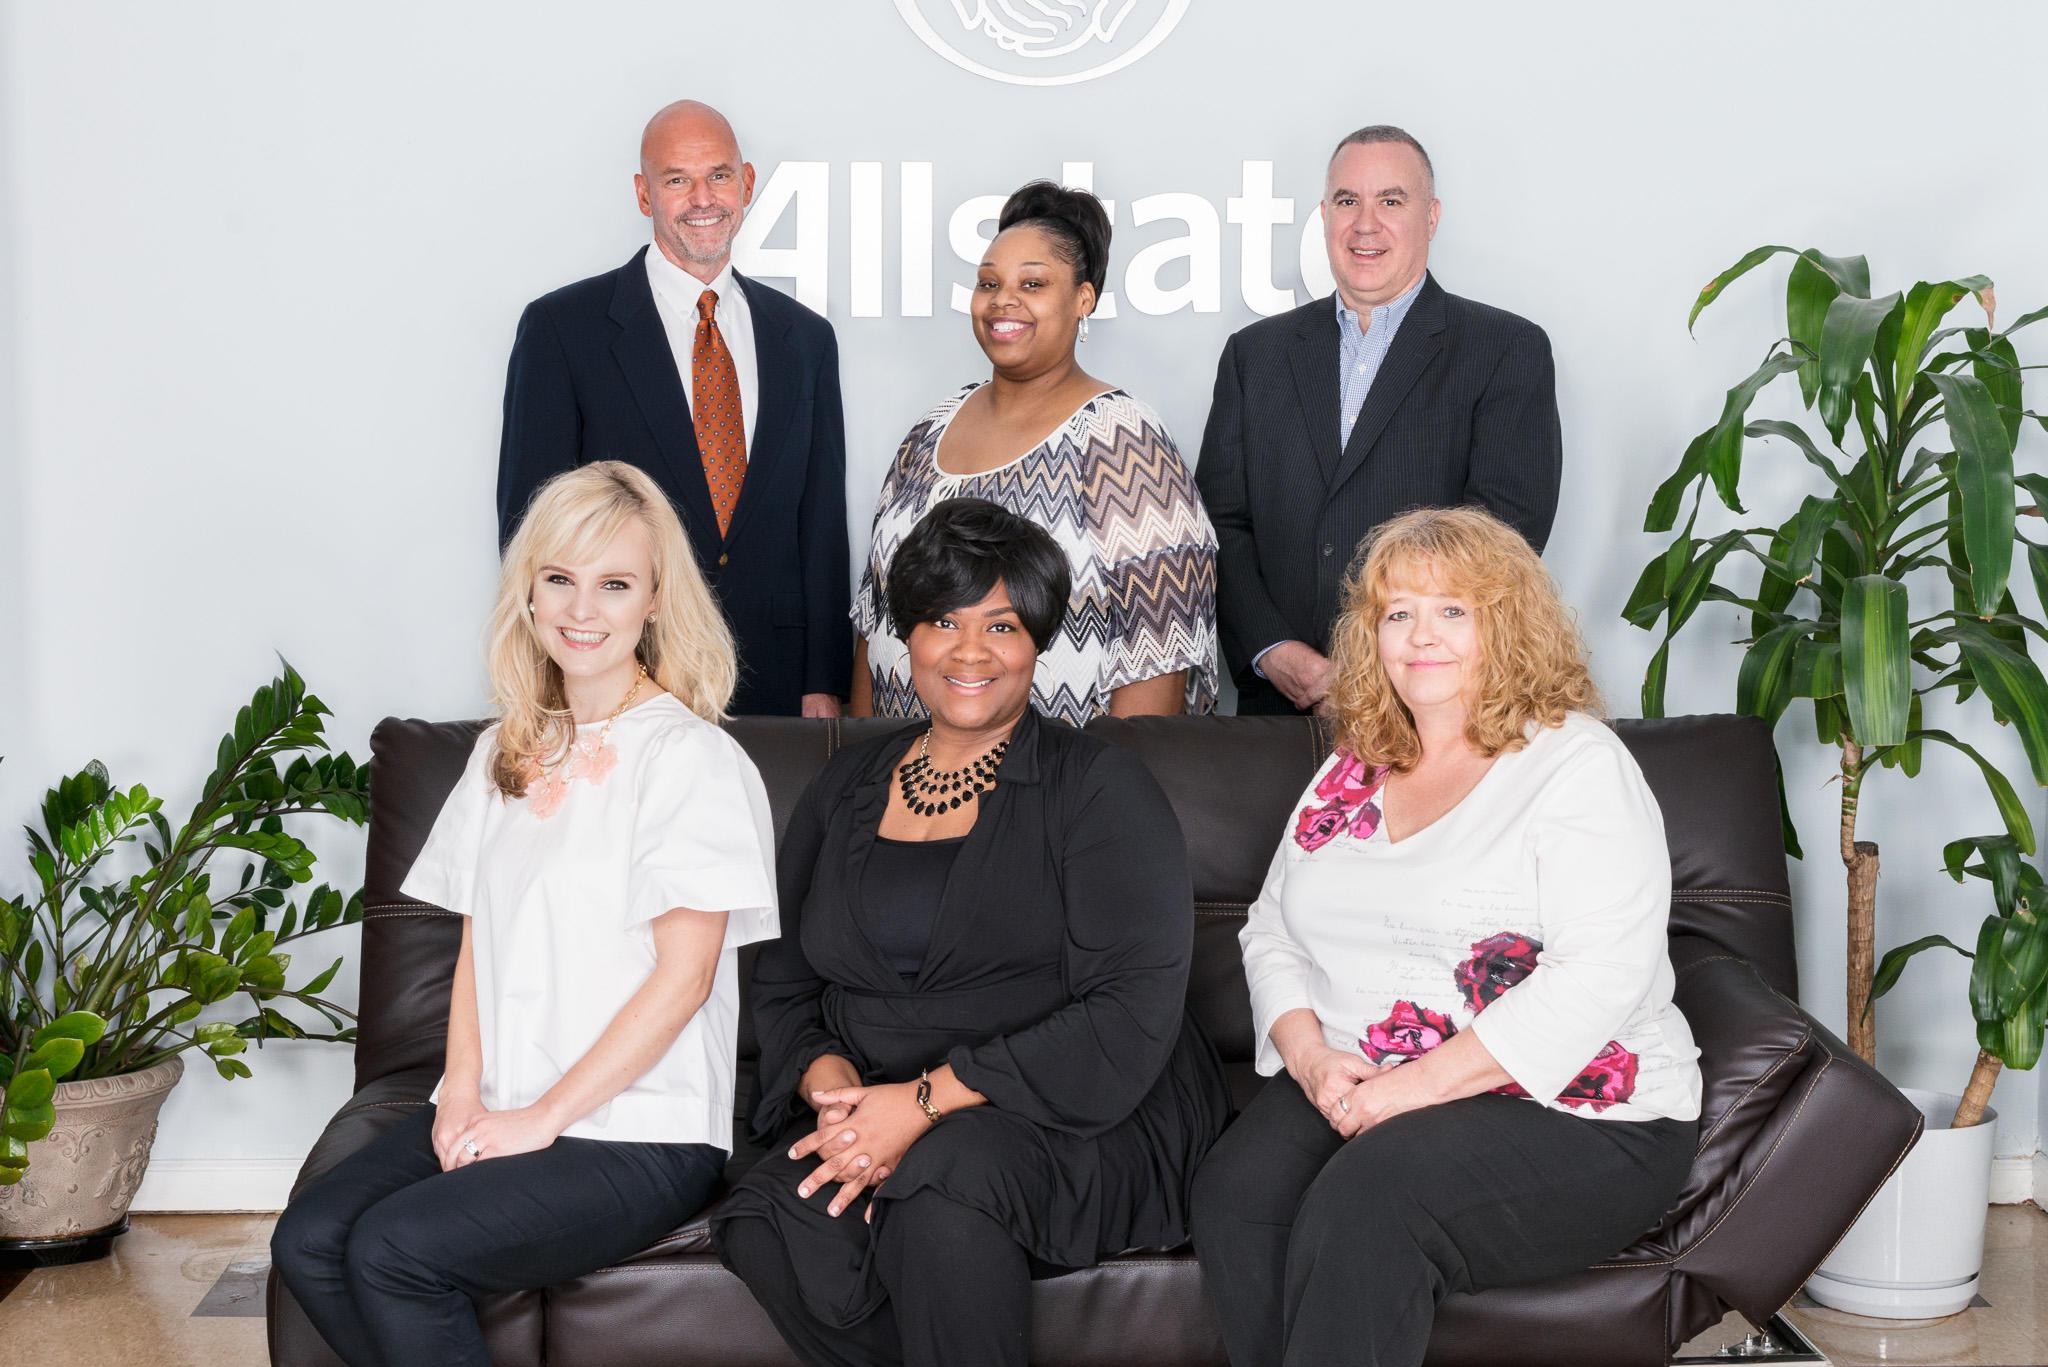 Royce Williams: Allstate Insurance image 5